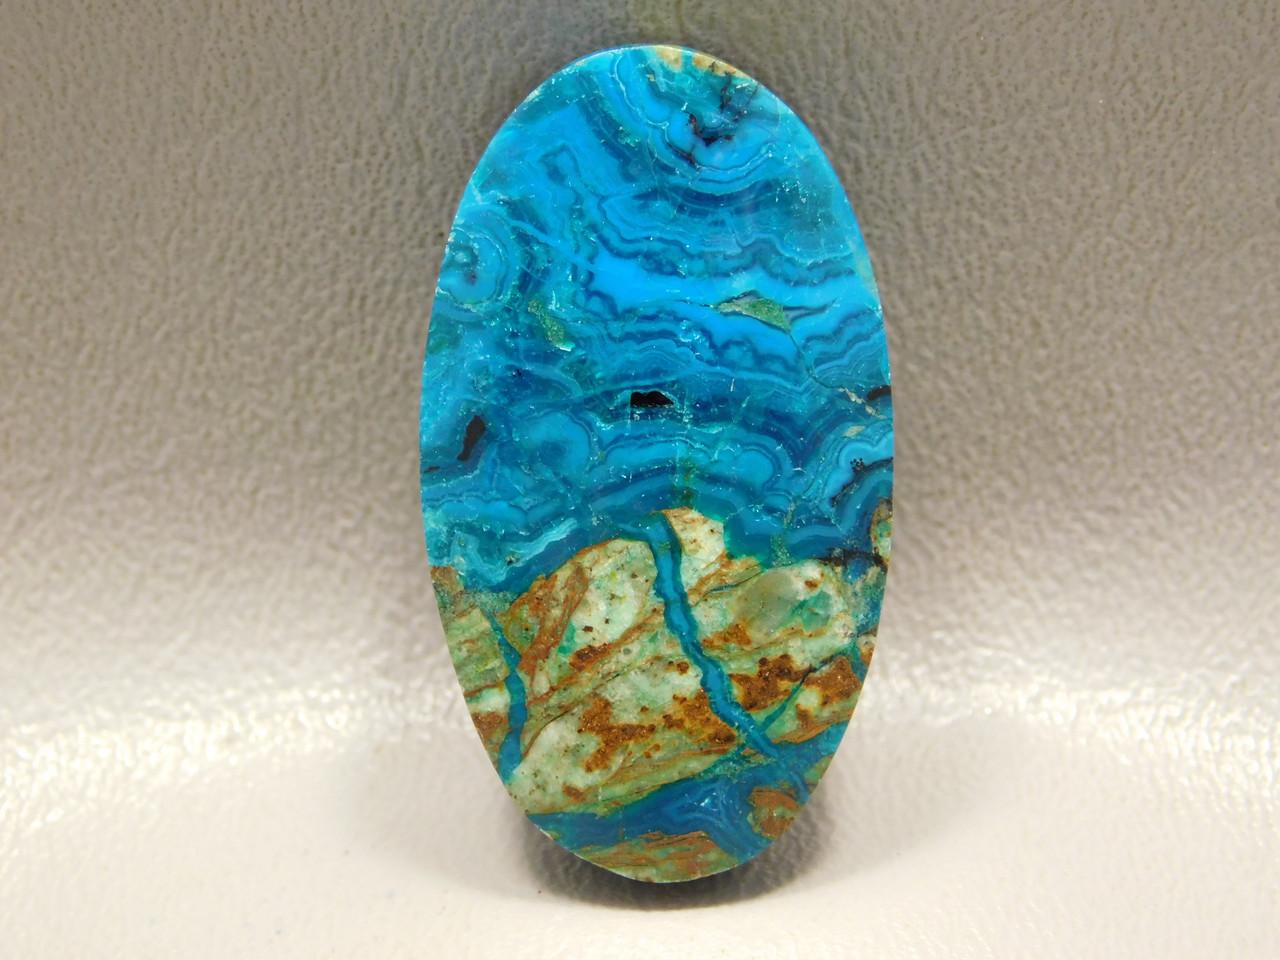 Chrysocolla Malachite Gemstone Drilled Bead Pendant Stone #6